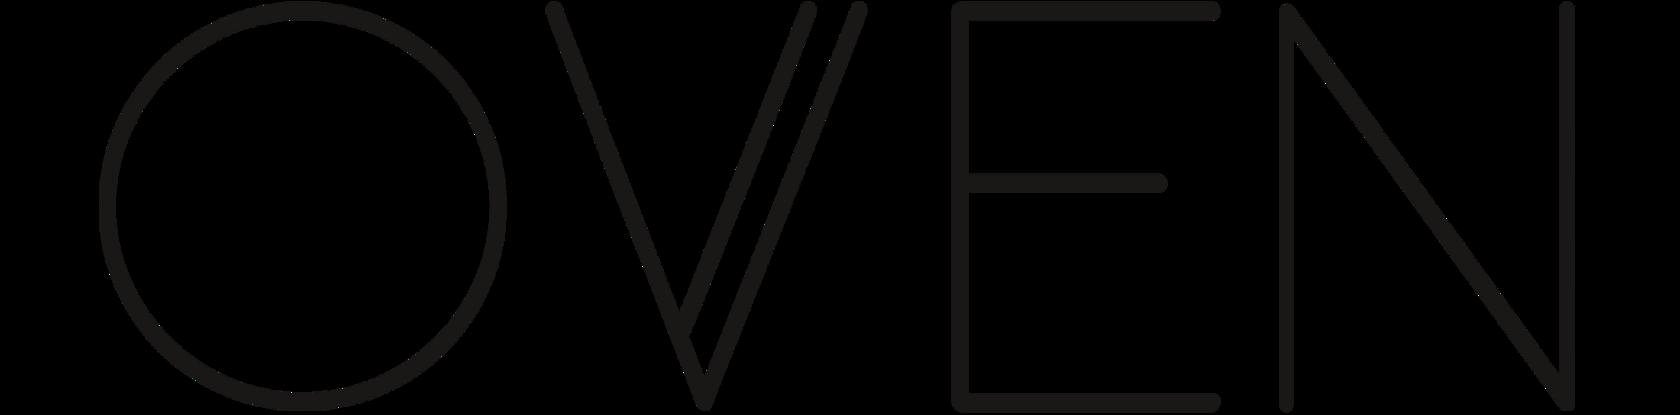 Oven brand шубы пальто пуховики